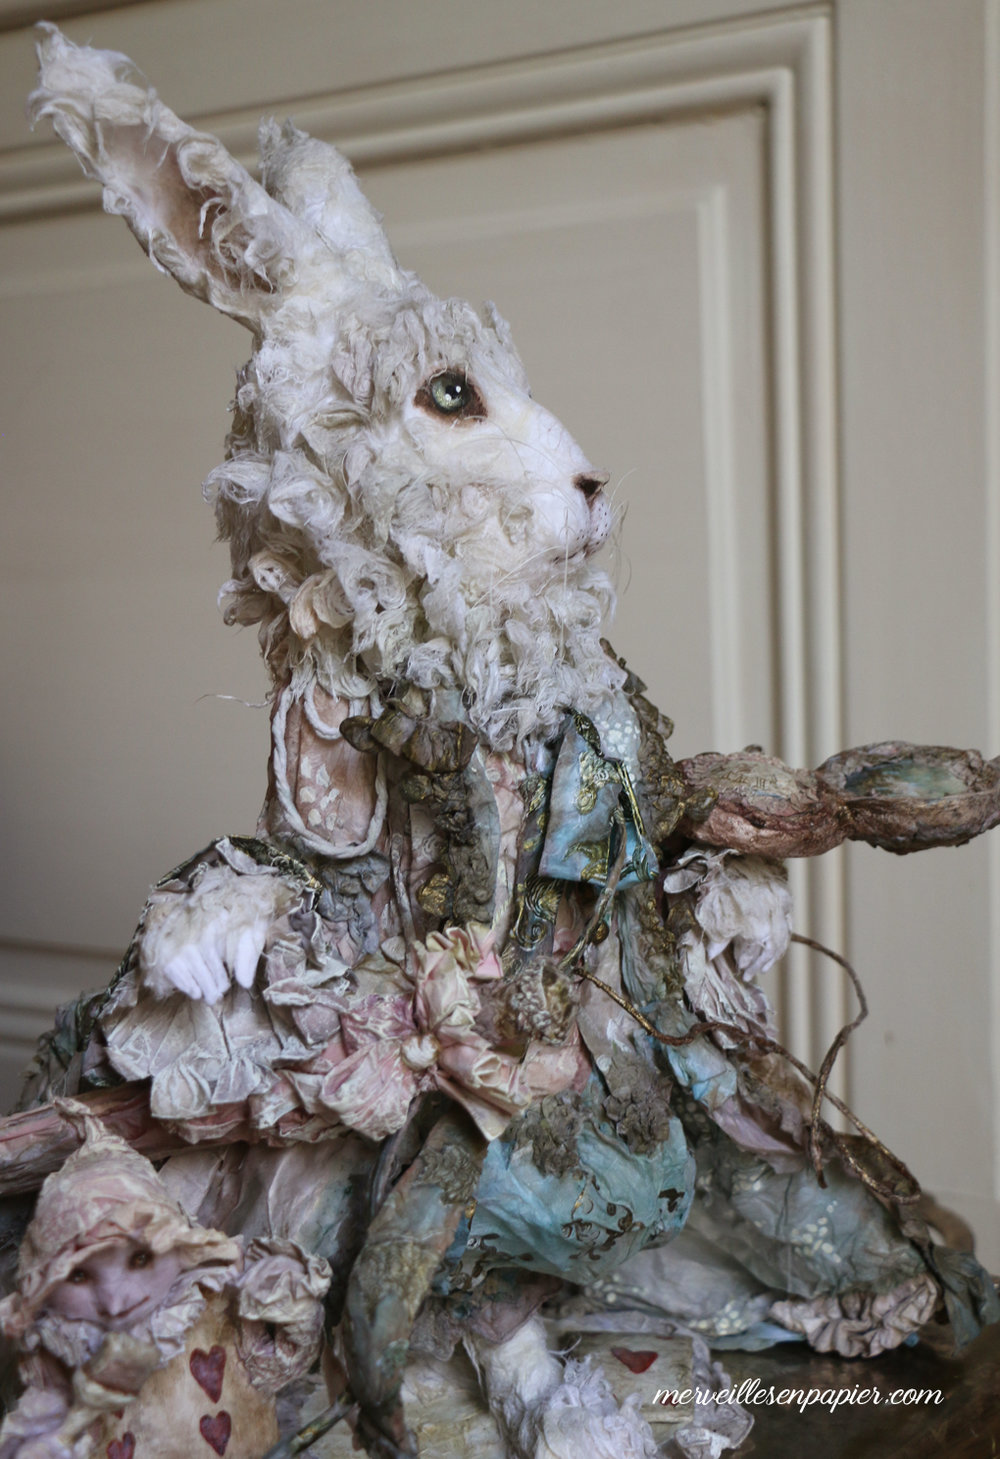 white-rabbit-alice-in-wonderland-105.jpg